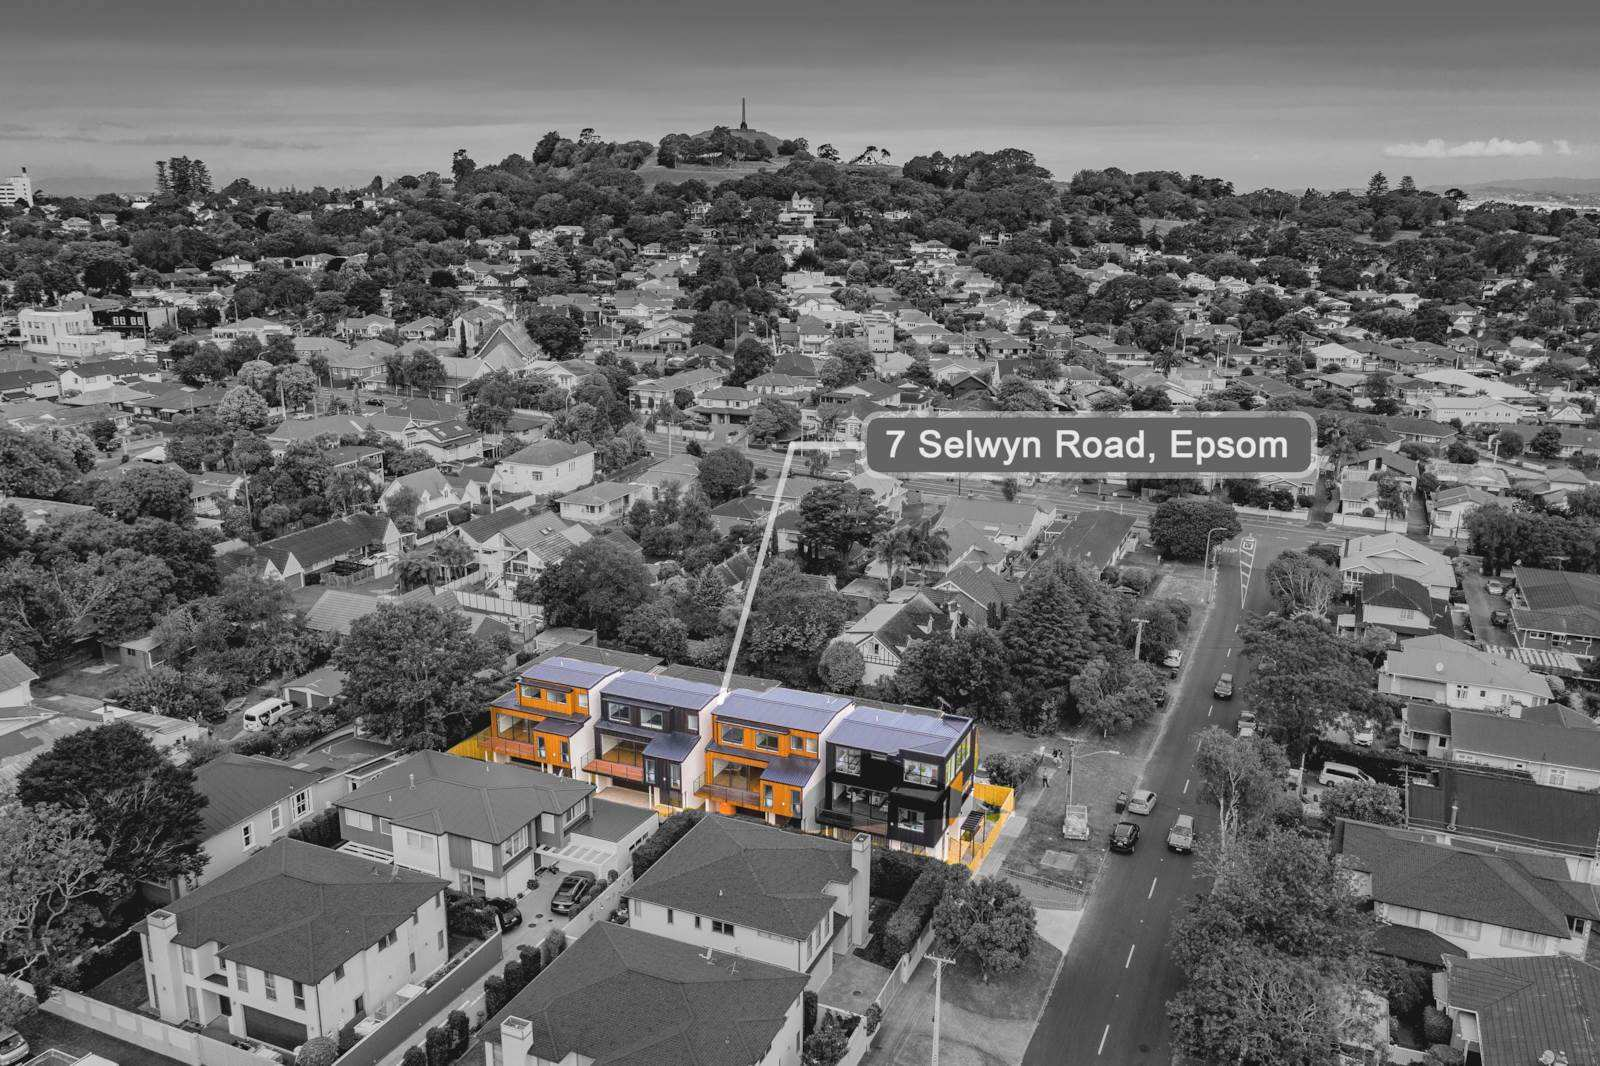 Epsom 5房 双校网全新城市屋 名师匠心之作 步行至公园 紧邻繁华商圈 地段得天独厚! 2021 Statement Home in the DG Zone